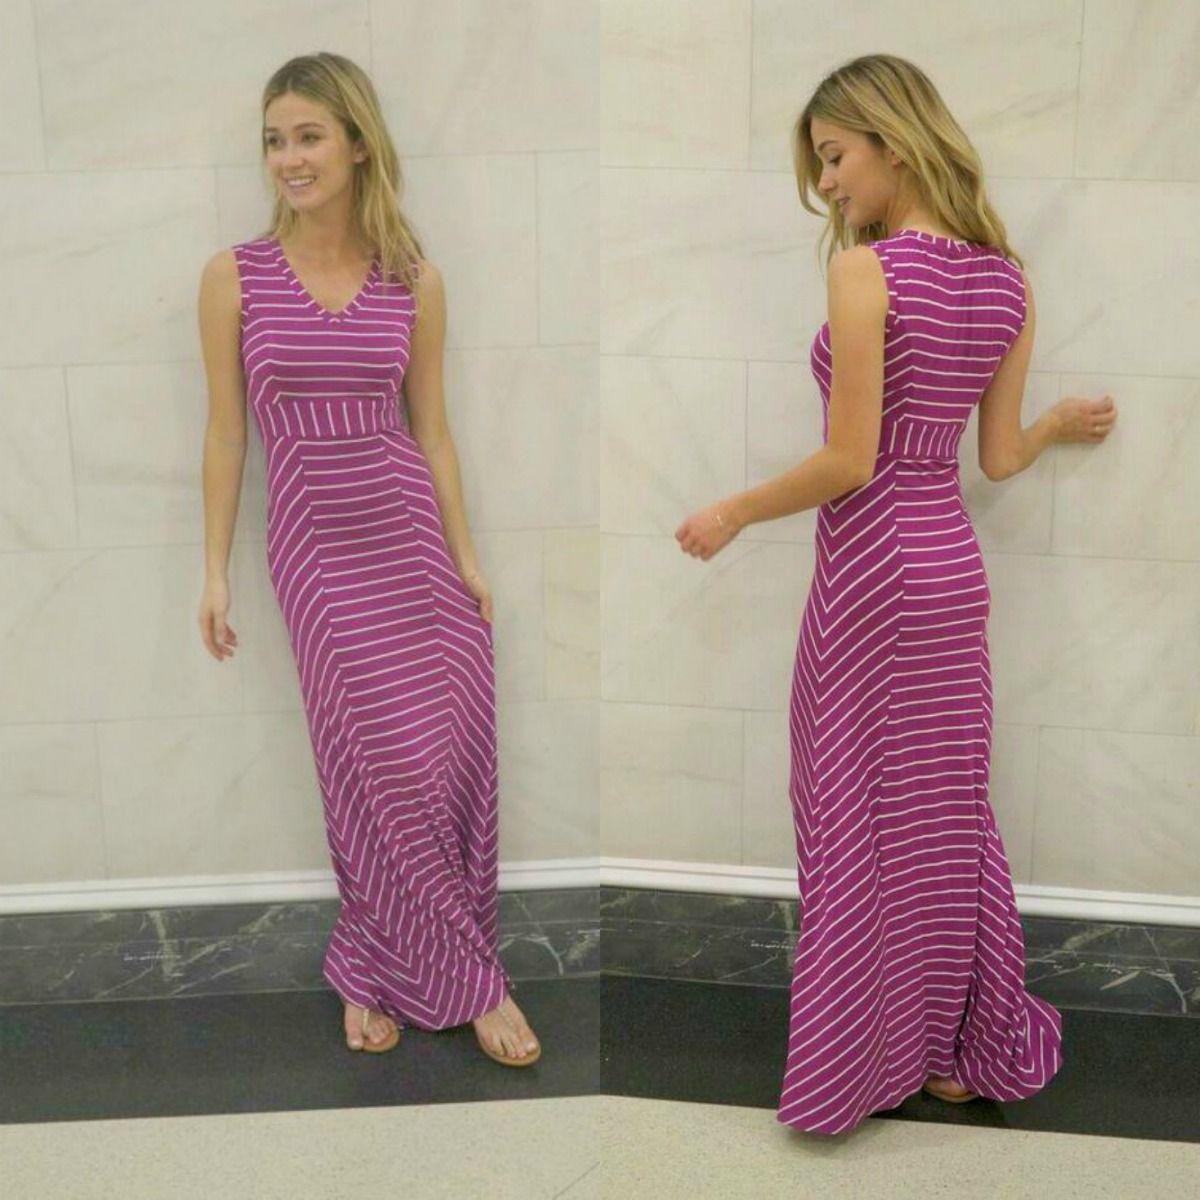 Butterick B6449 maxi dress sewing pattern for knits. | Maxi Dress ...